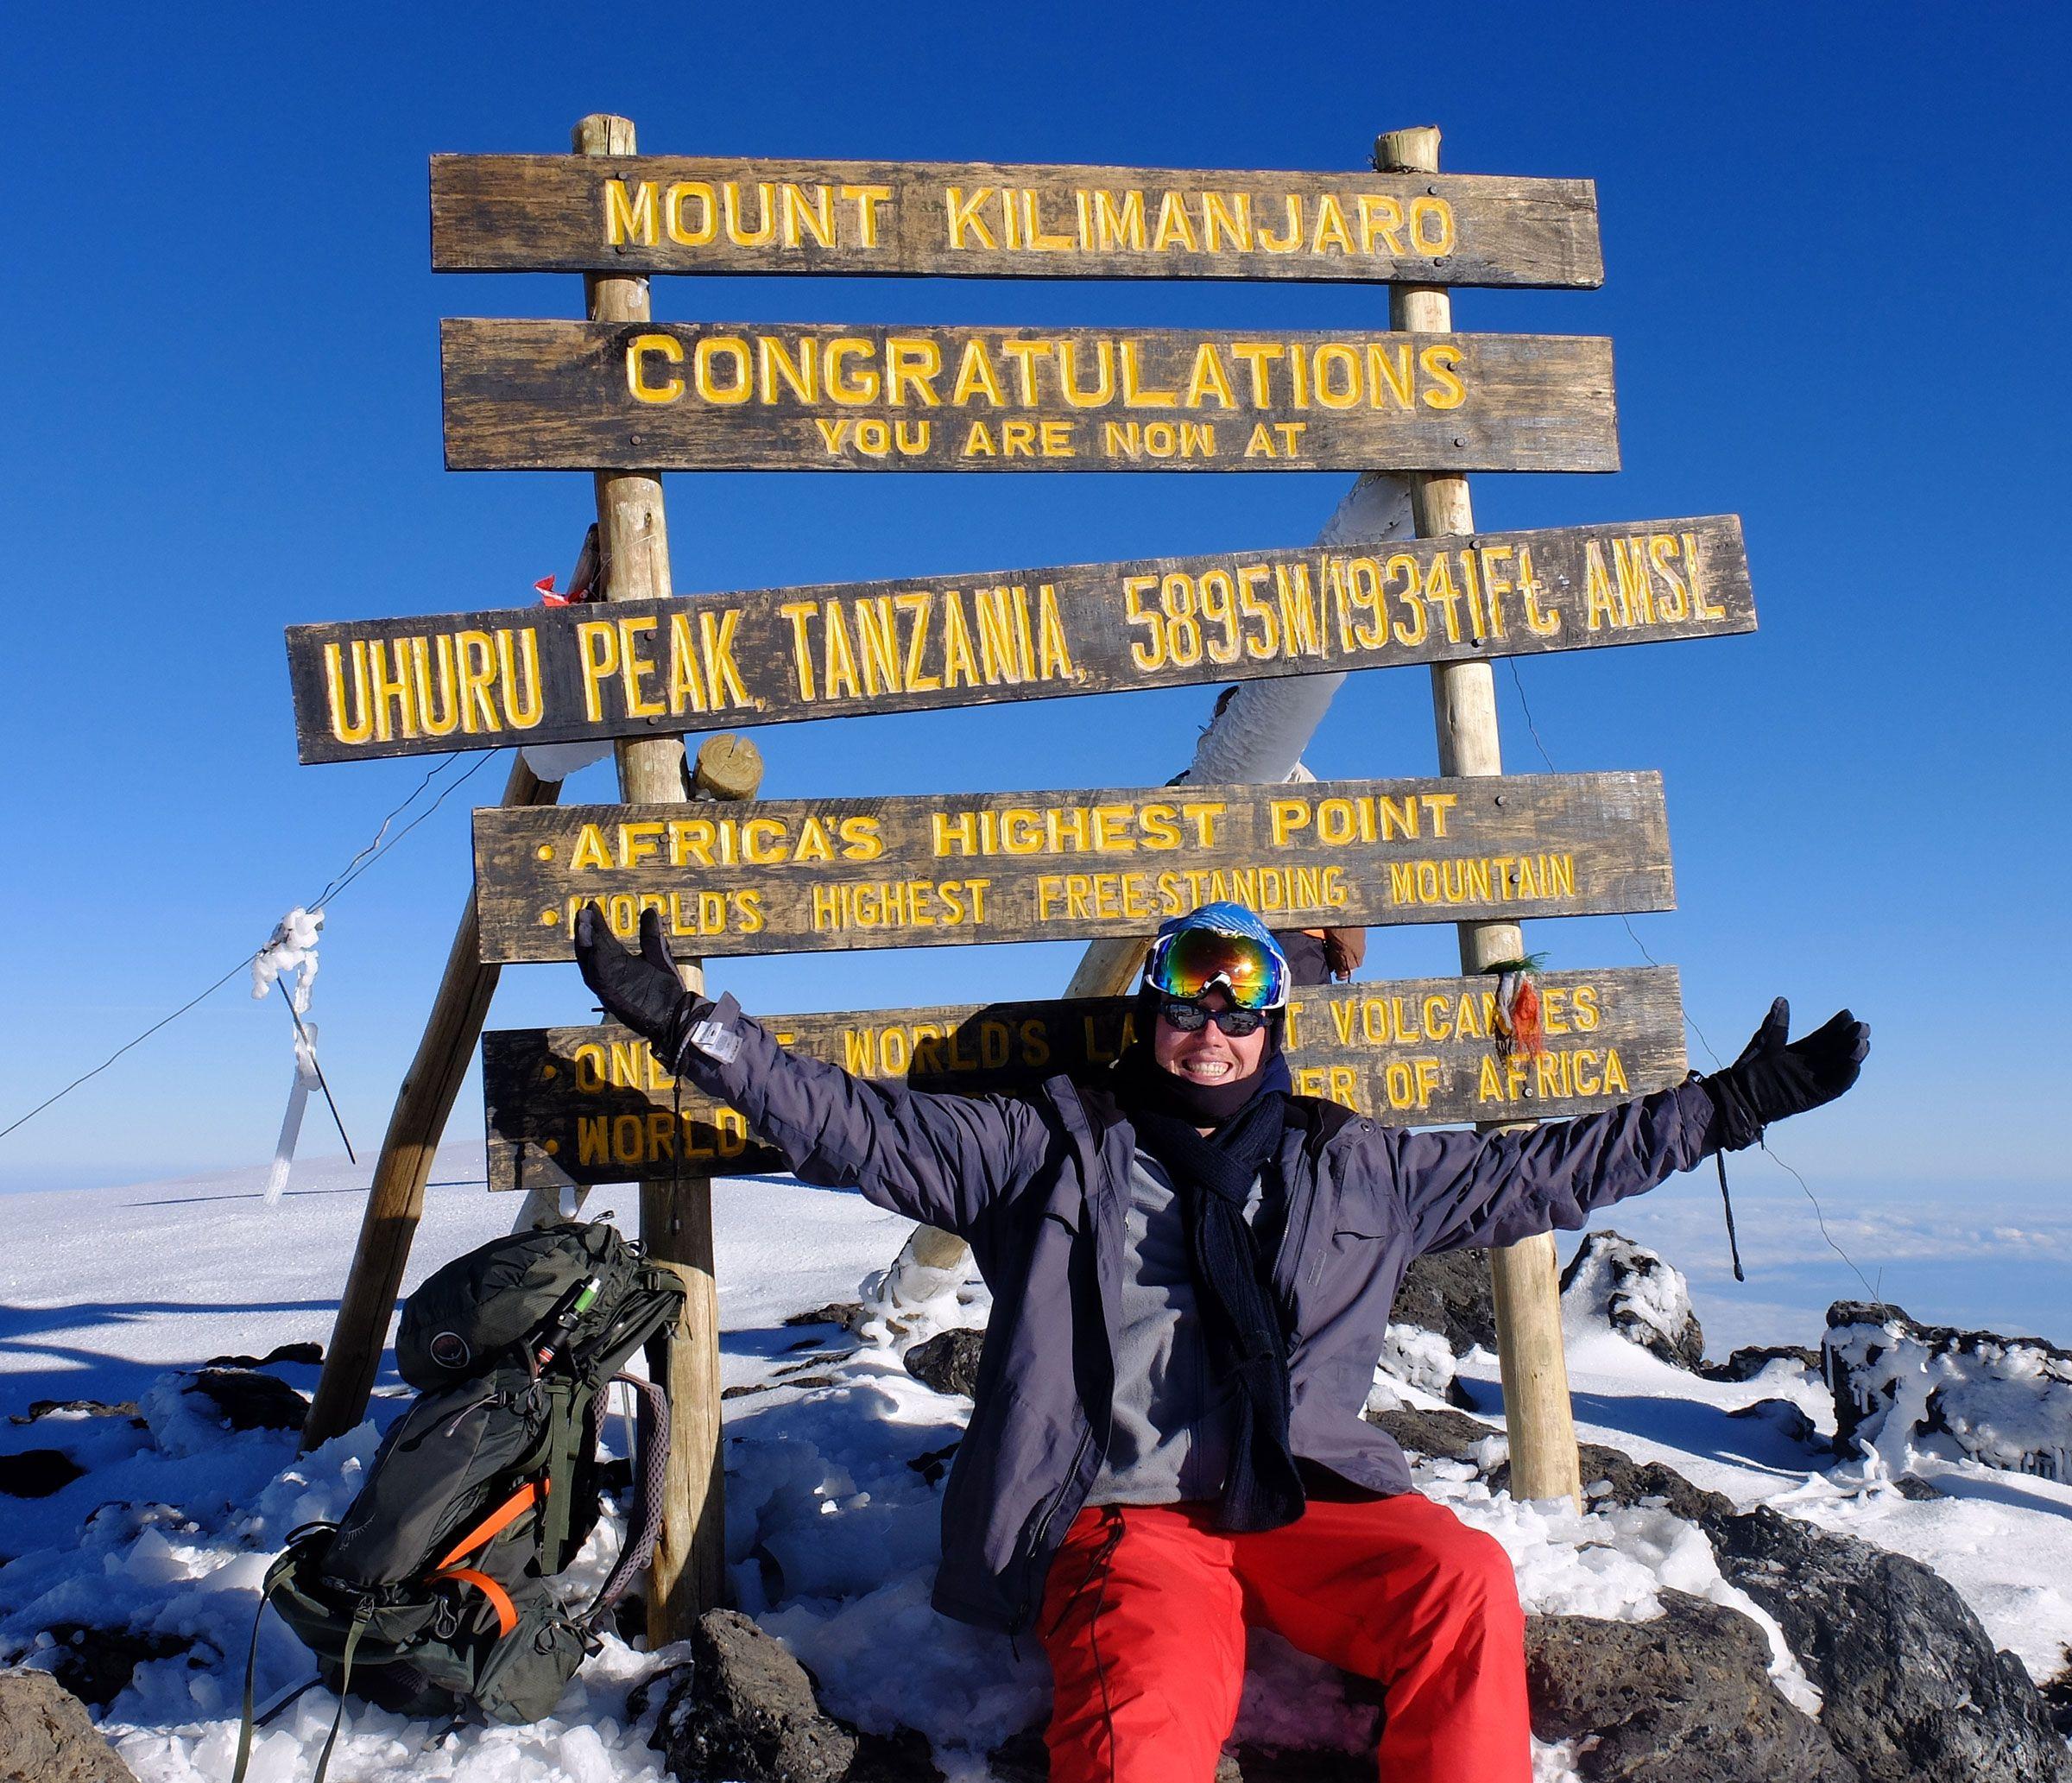 Mount Kilimanjaro and website testing